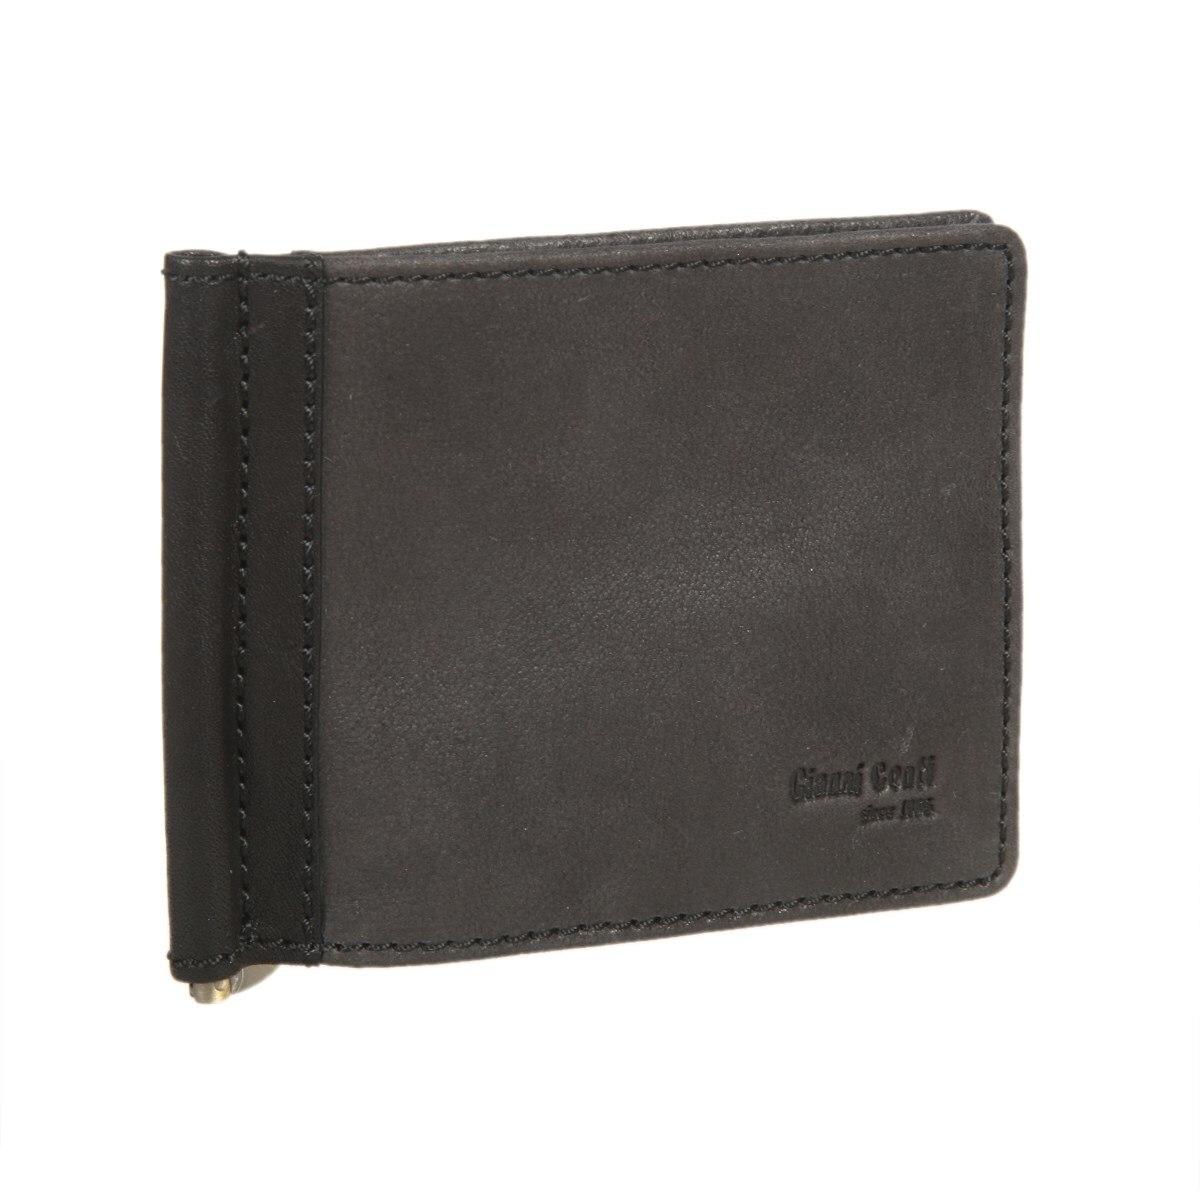 Money clip Gianni Conti 2187466 black 2017 men leather brand luxury wallet vintage minimalist short male purses money clip credit card dollar price portomonee